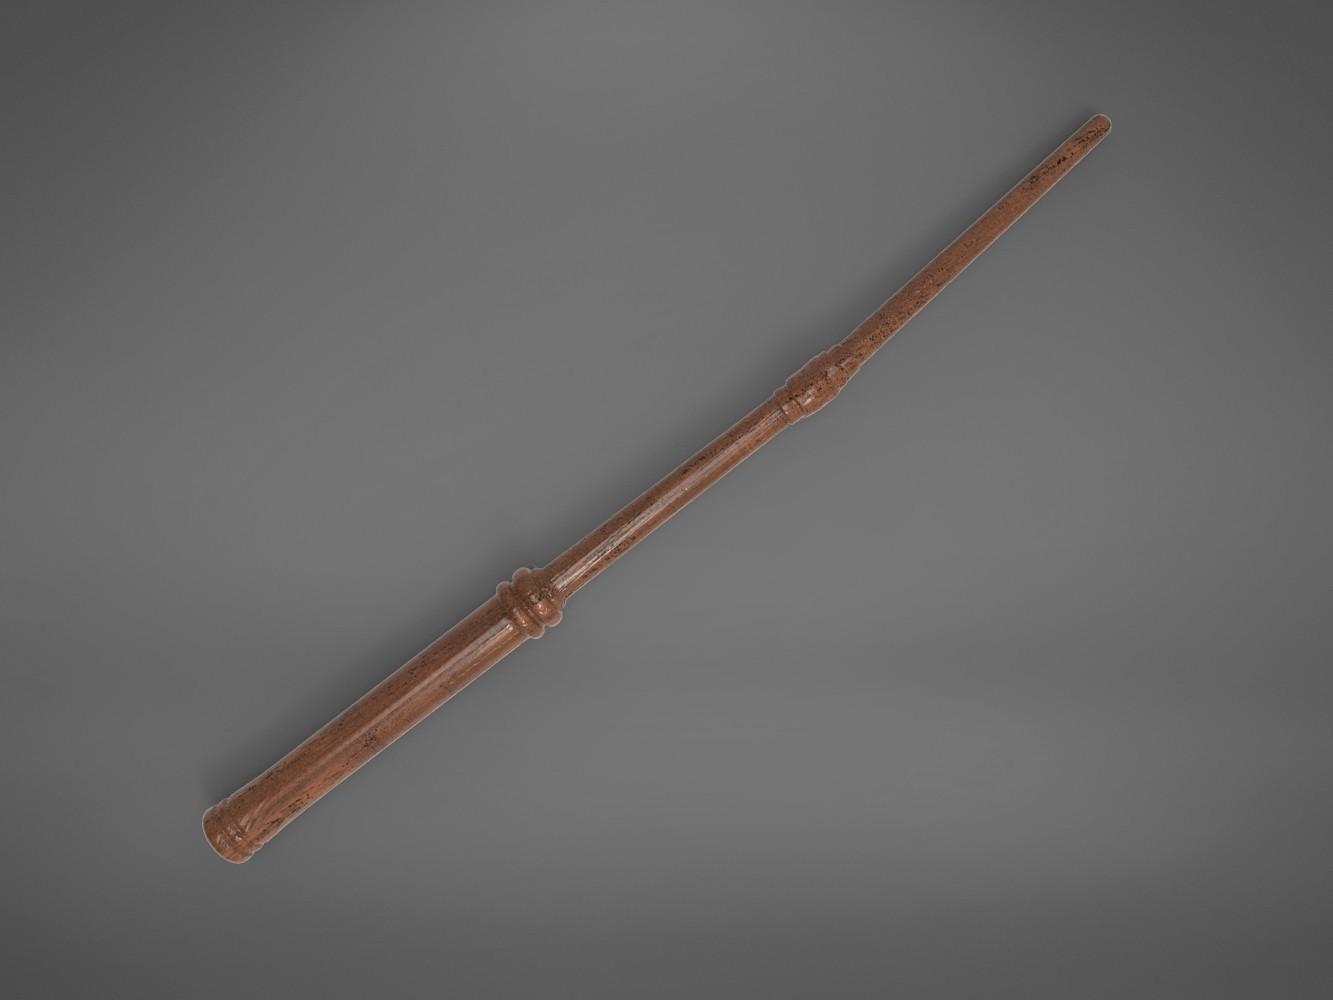 Bonus-top_perspective.682.jpg Download STL file Ron Weasley broken wand - Harry Potter films 3D print model • 3D print design, 3D-mon